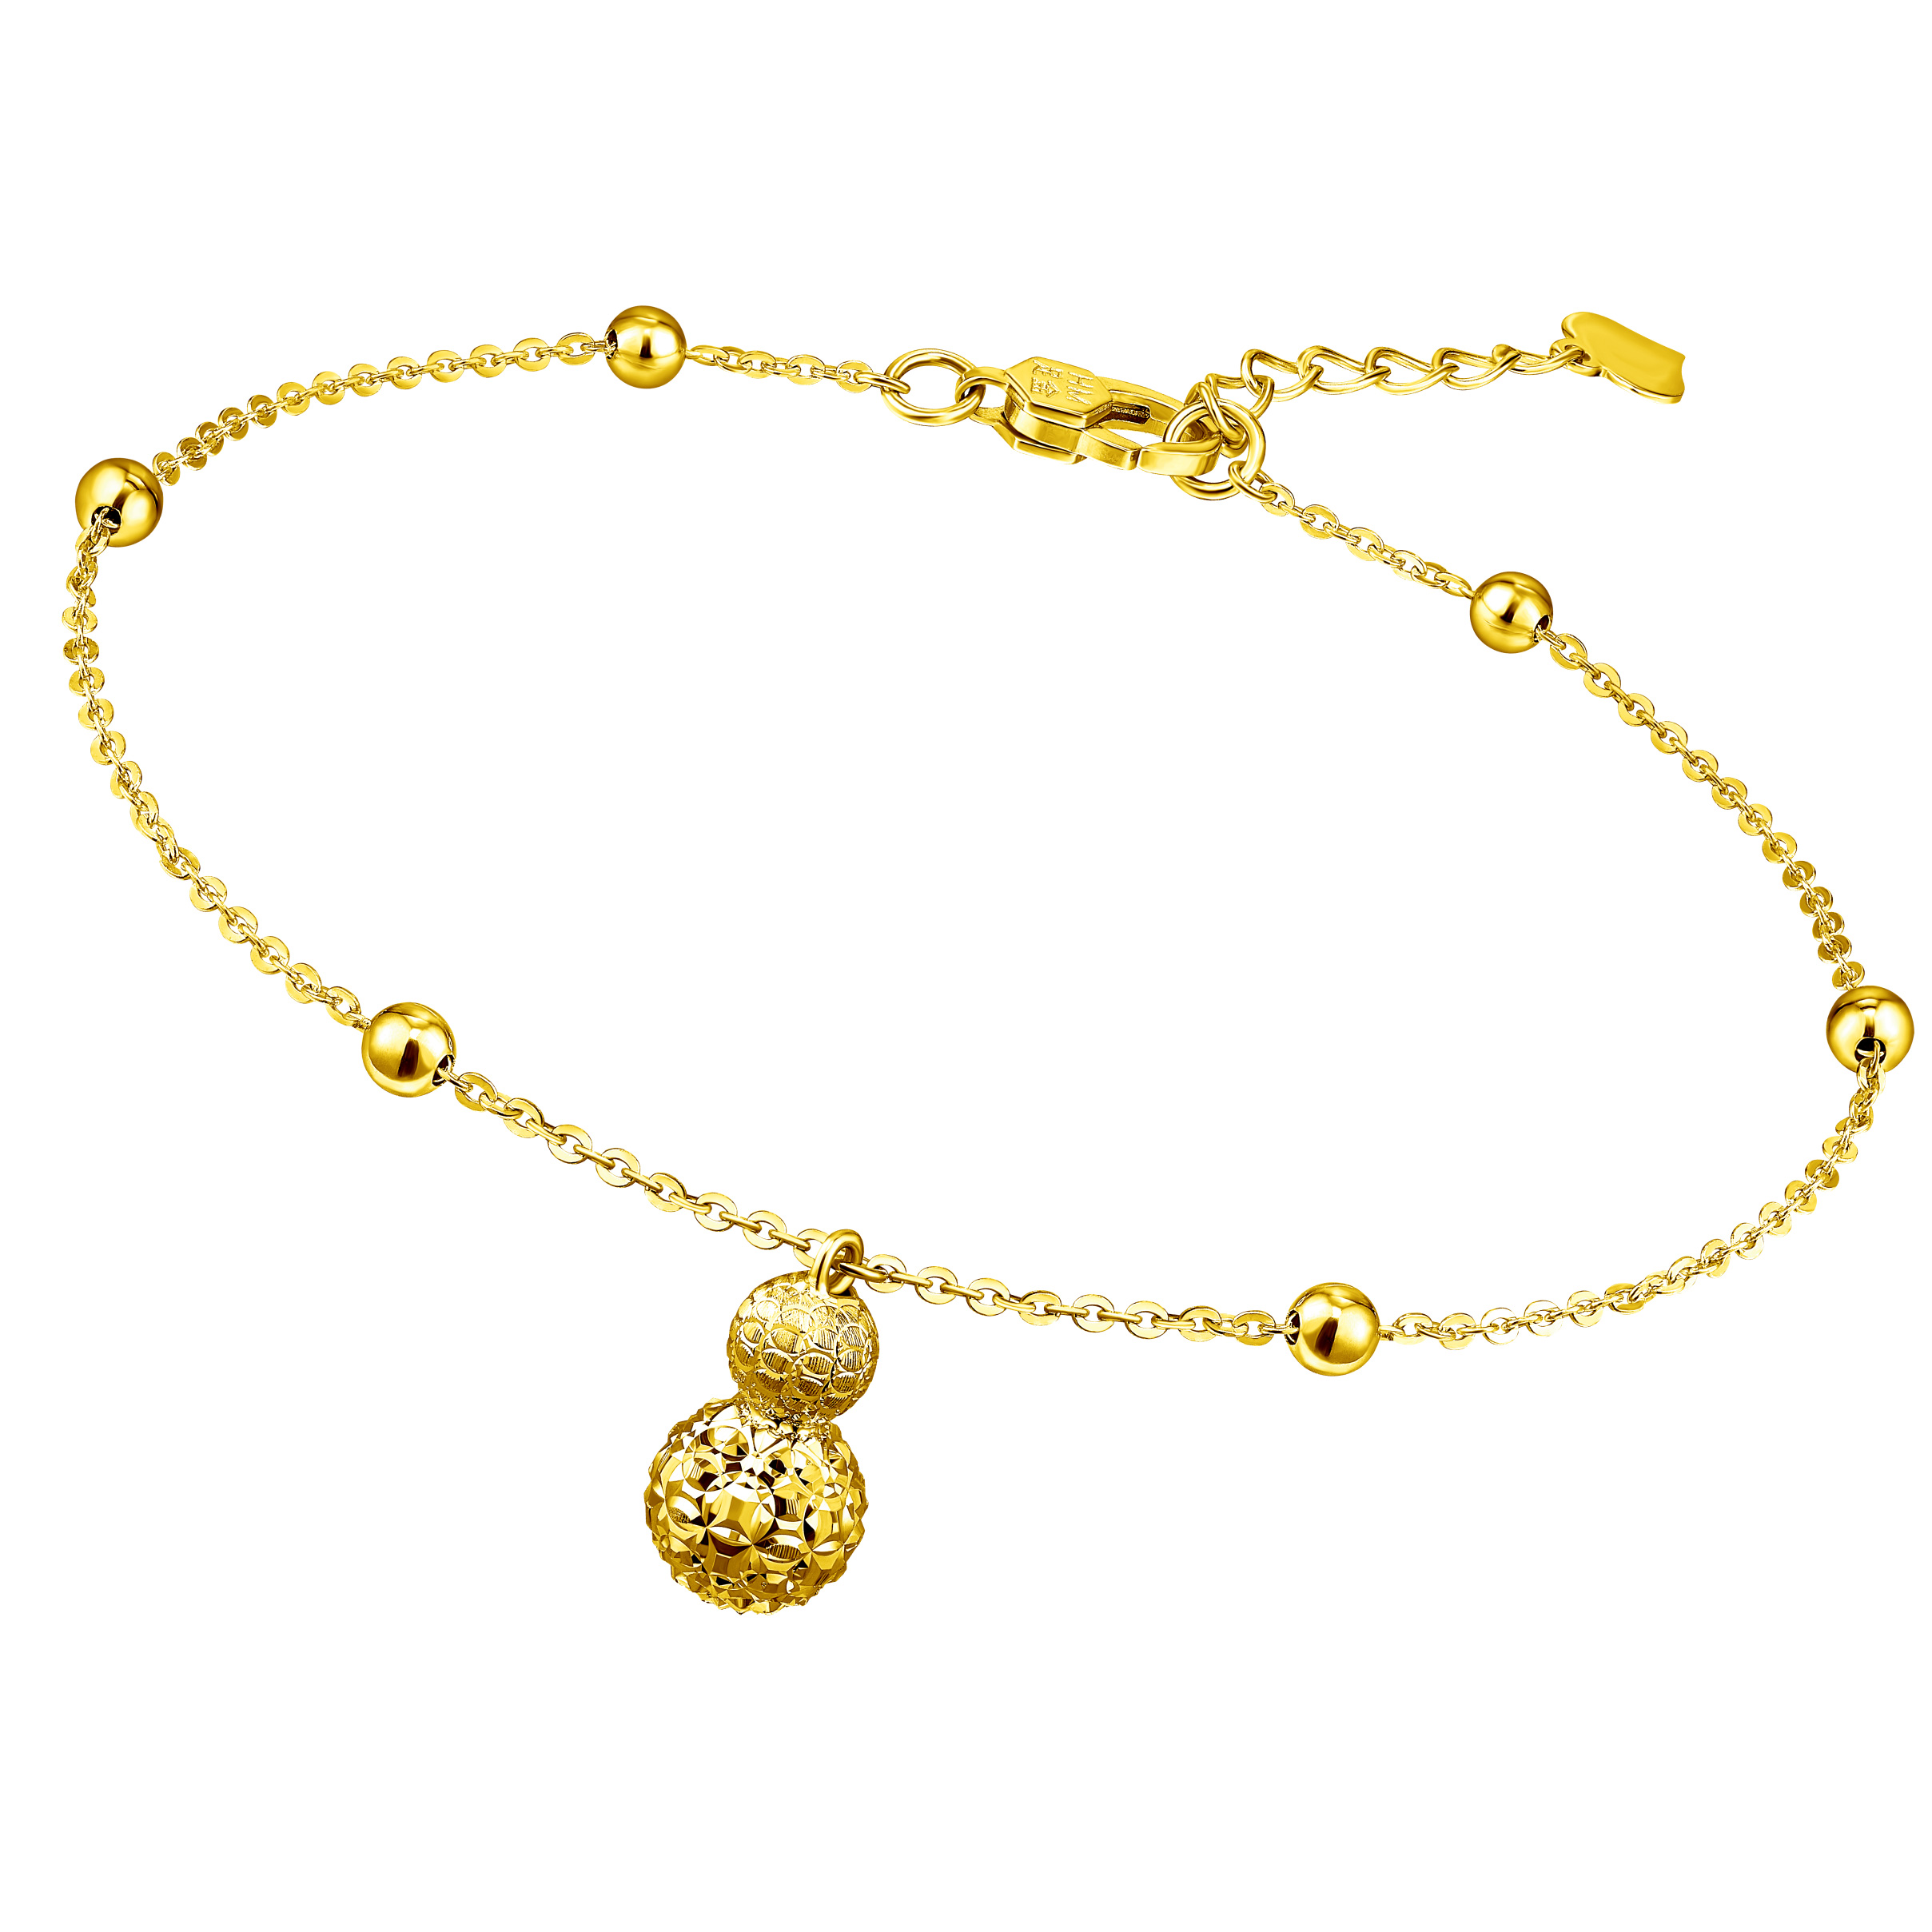 Goldstyle「治愈星球-葫芦」手链